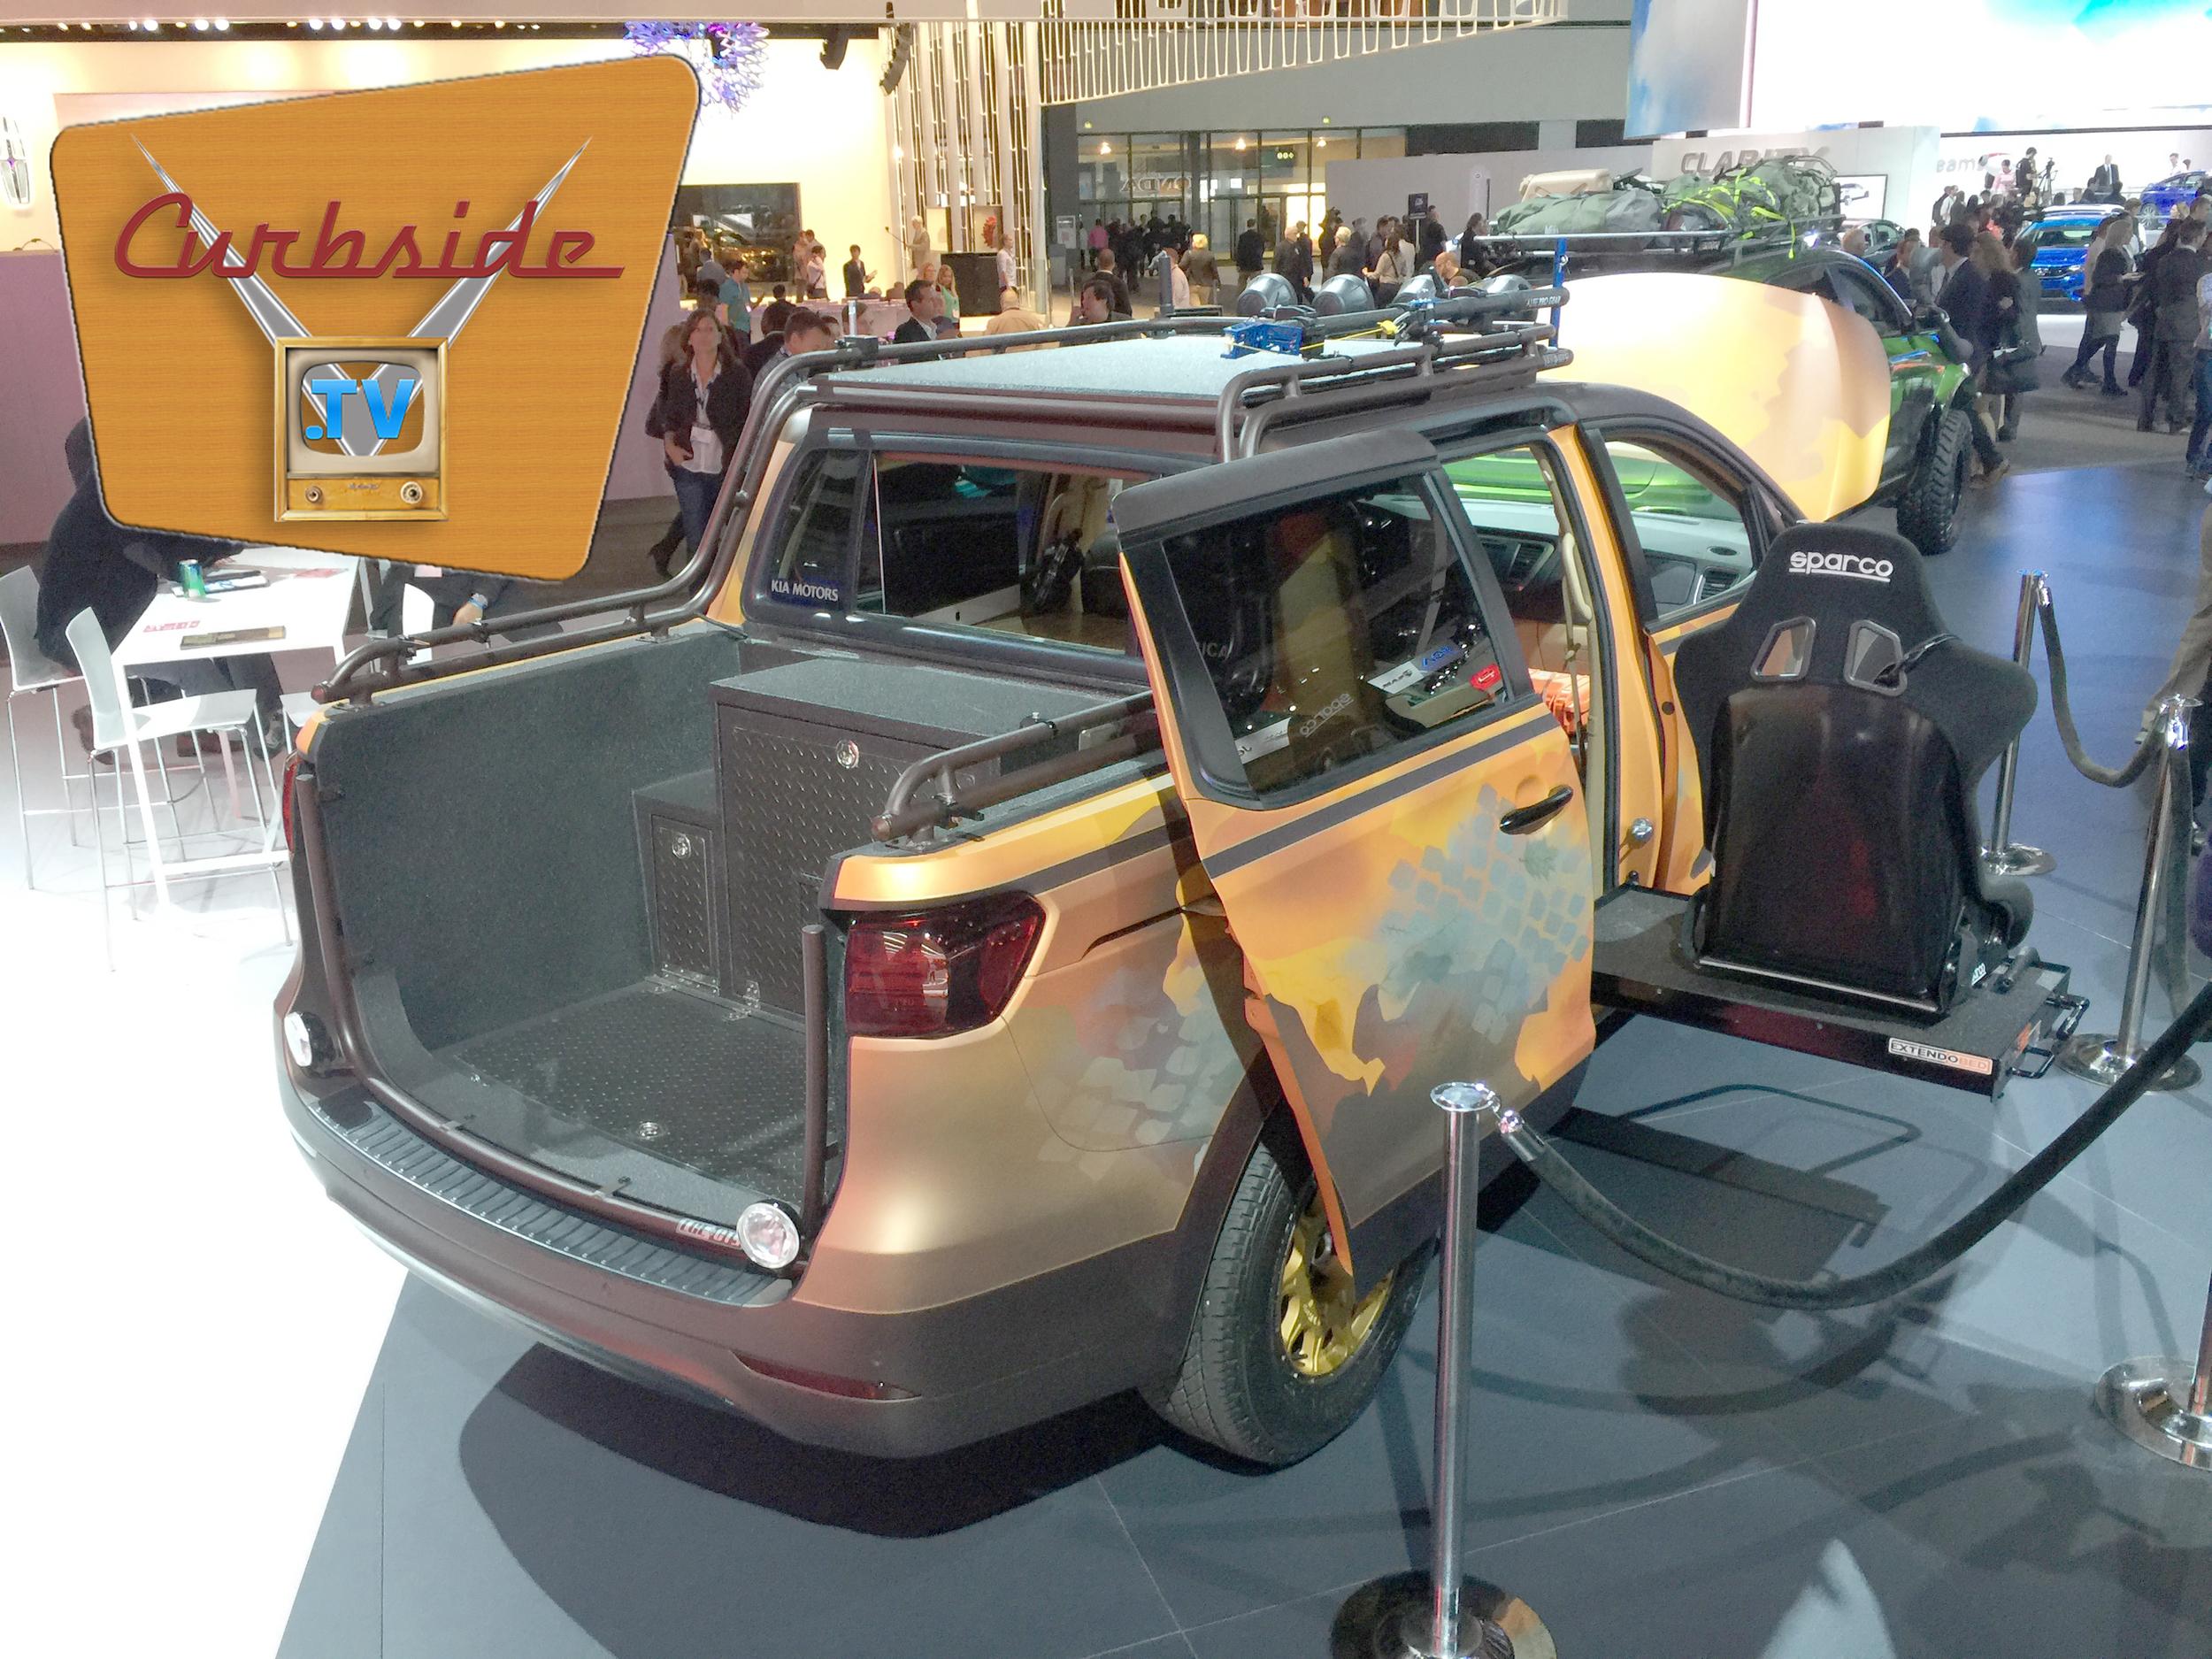 2015 LA Auto Show - 29.JPG